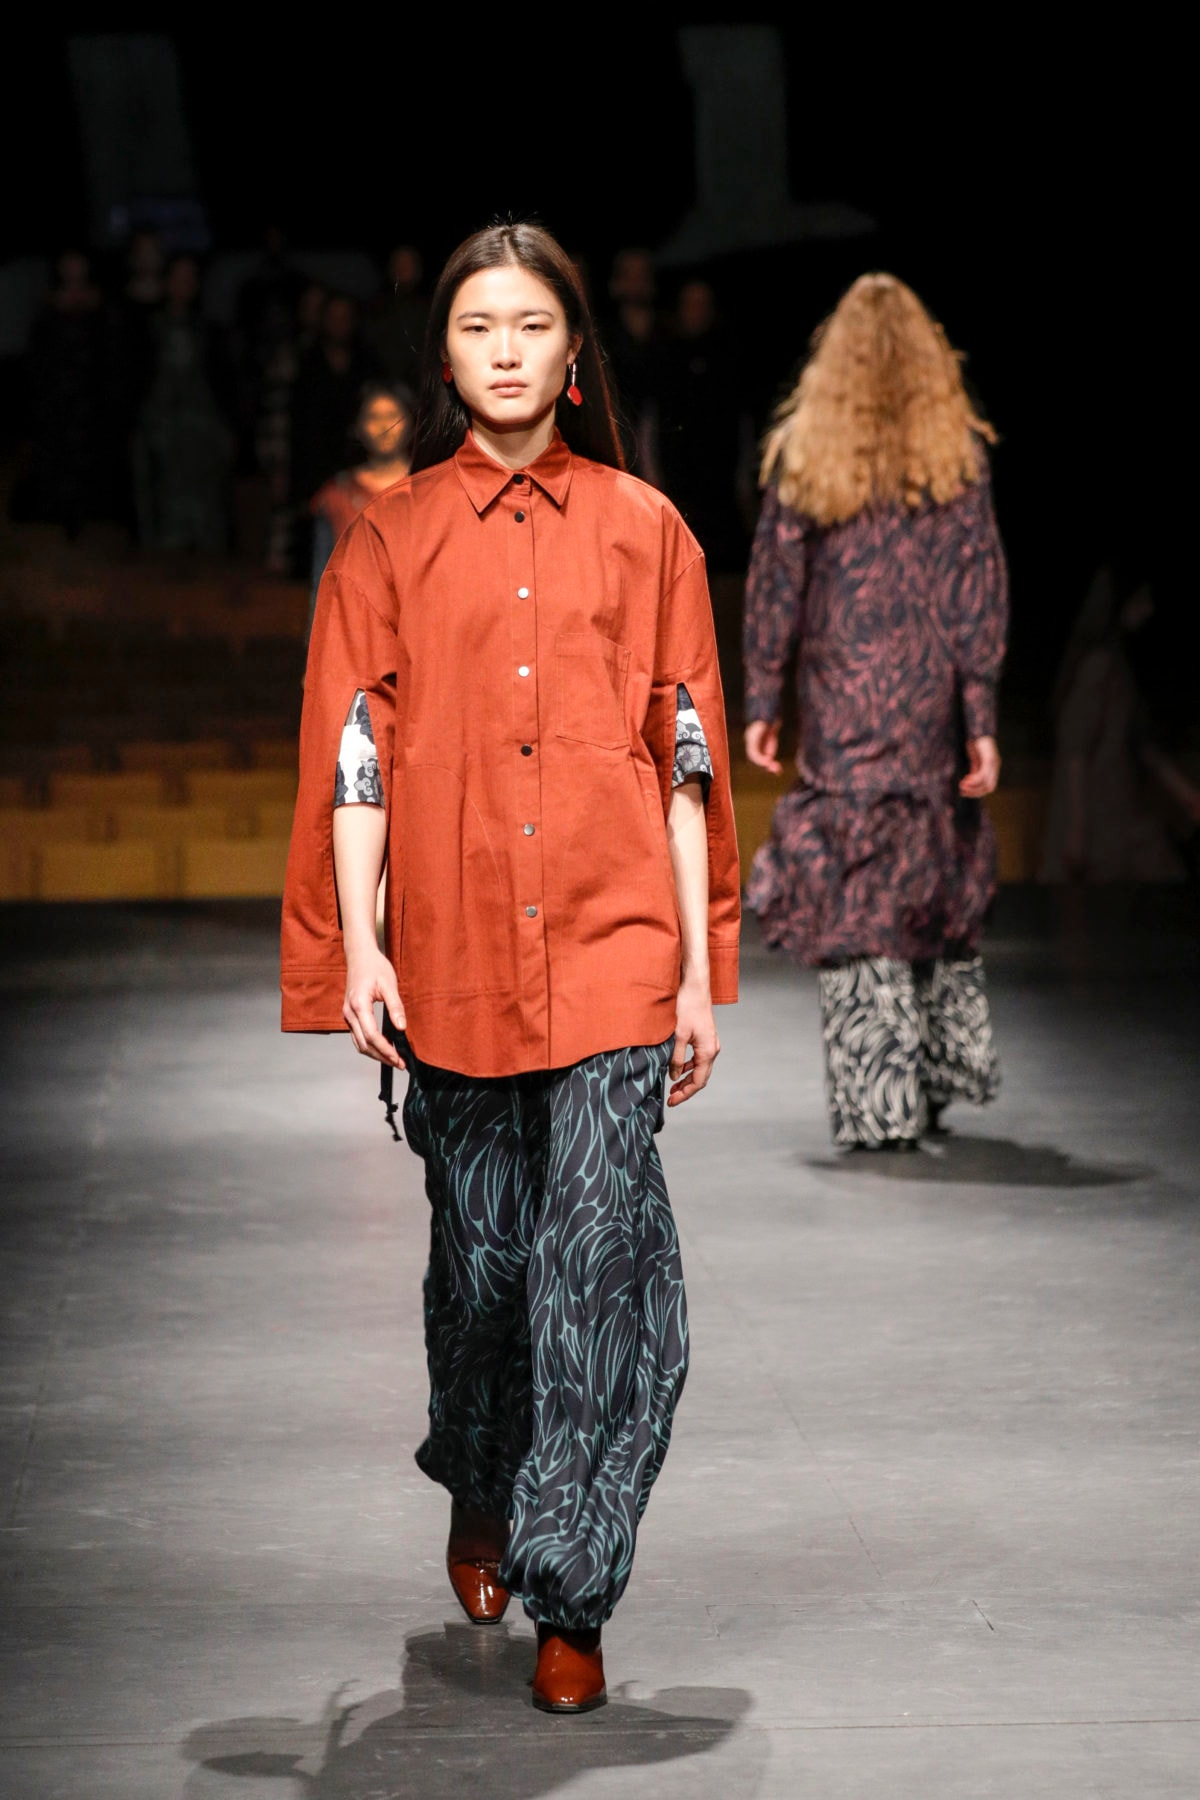 Odeeh Defile – Berlin Fashion Week Autumn/Winter 2019